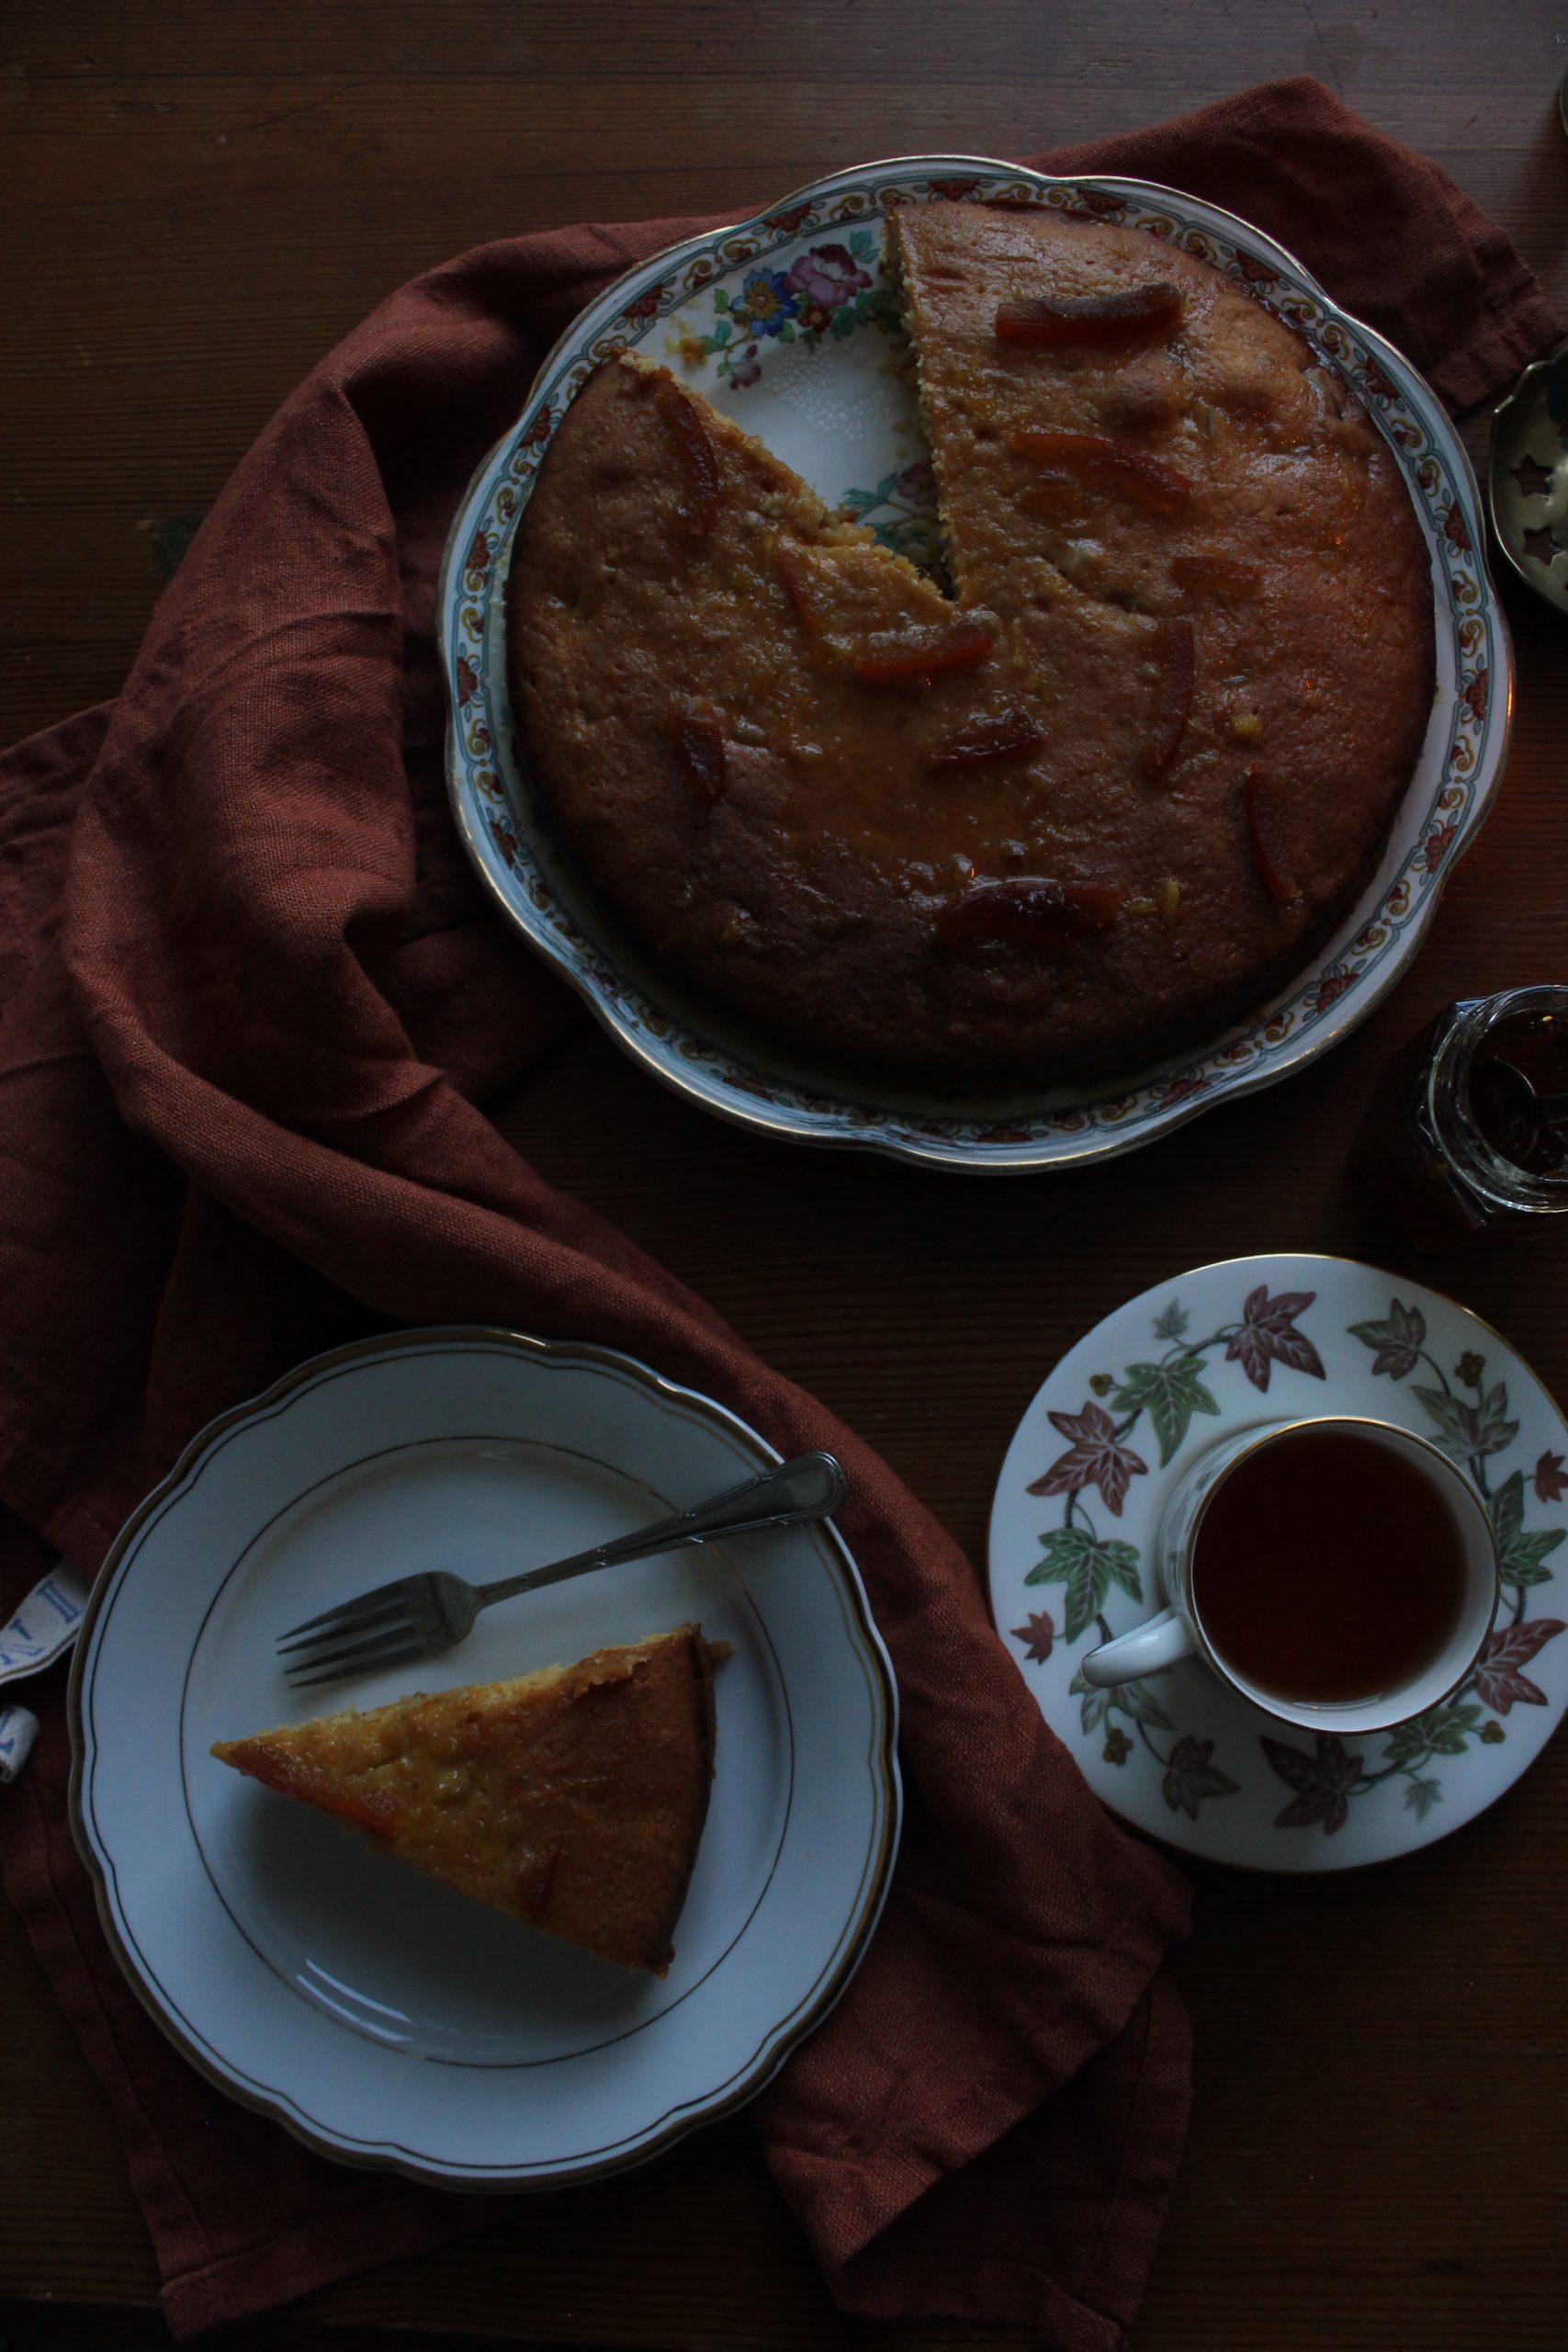 Marmalade and ginger cake